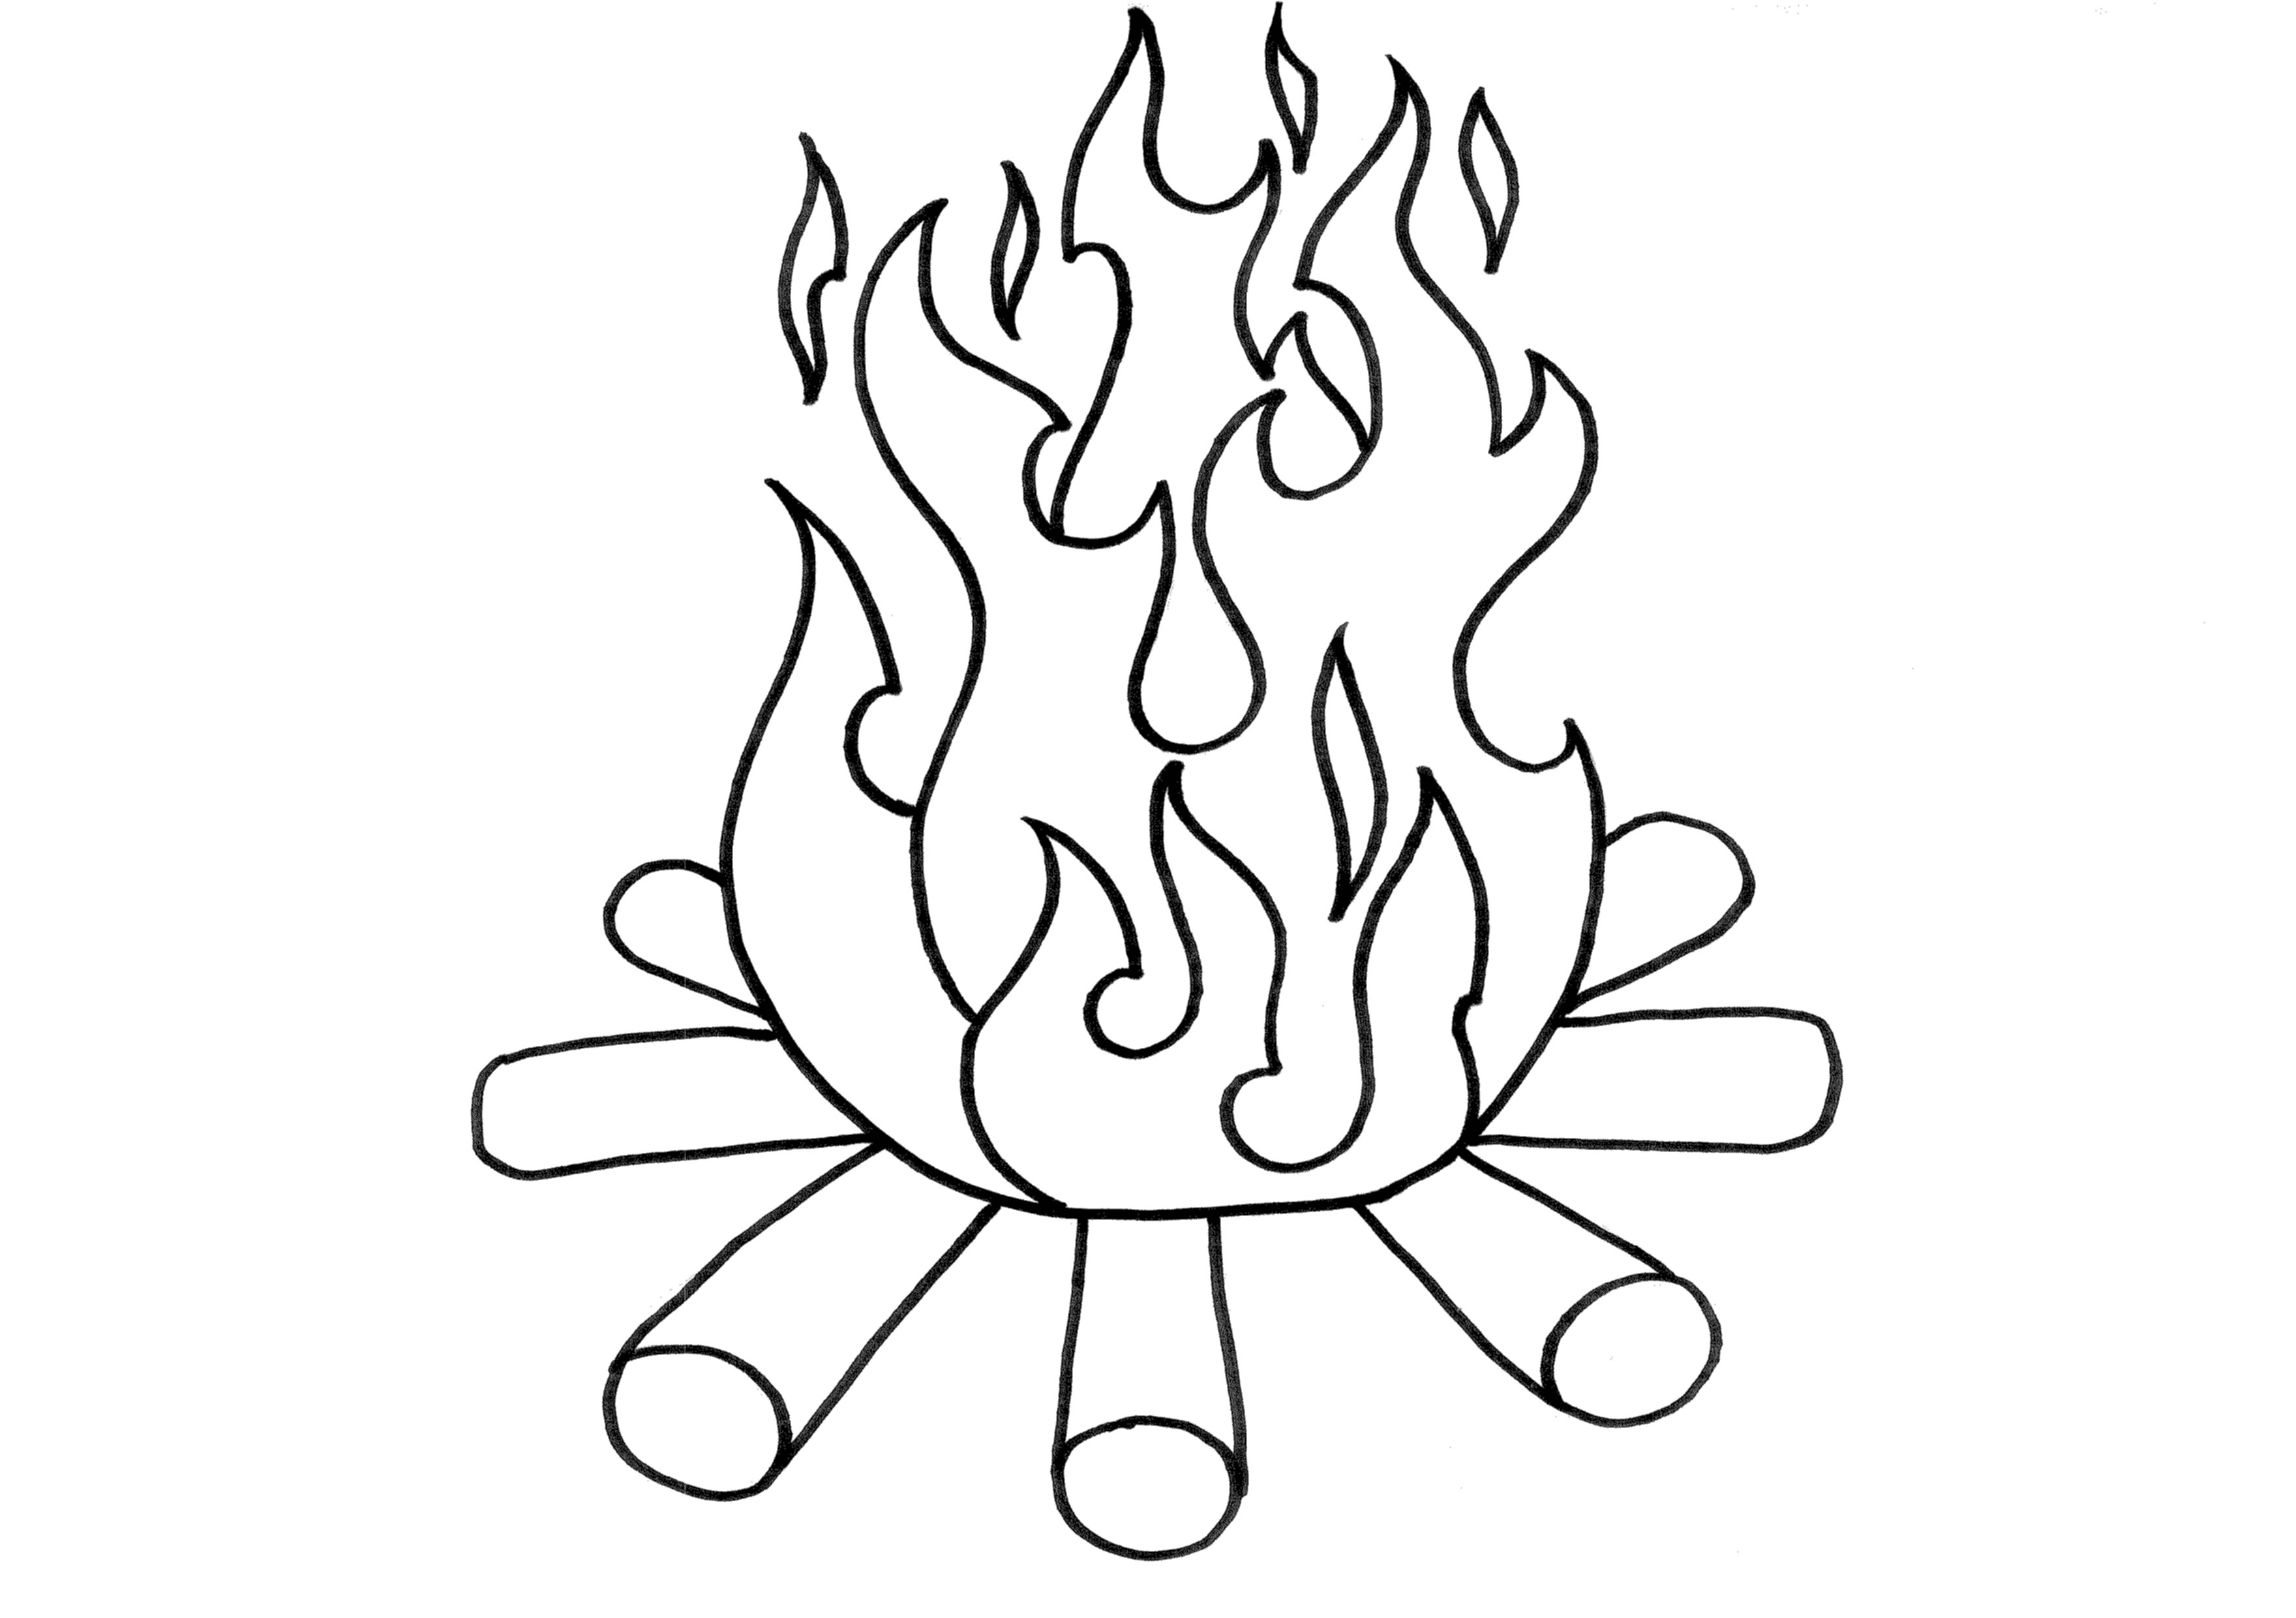 заказ рисунок огня в камине трафарет капа строго-настрого